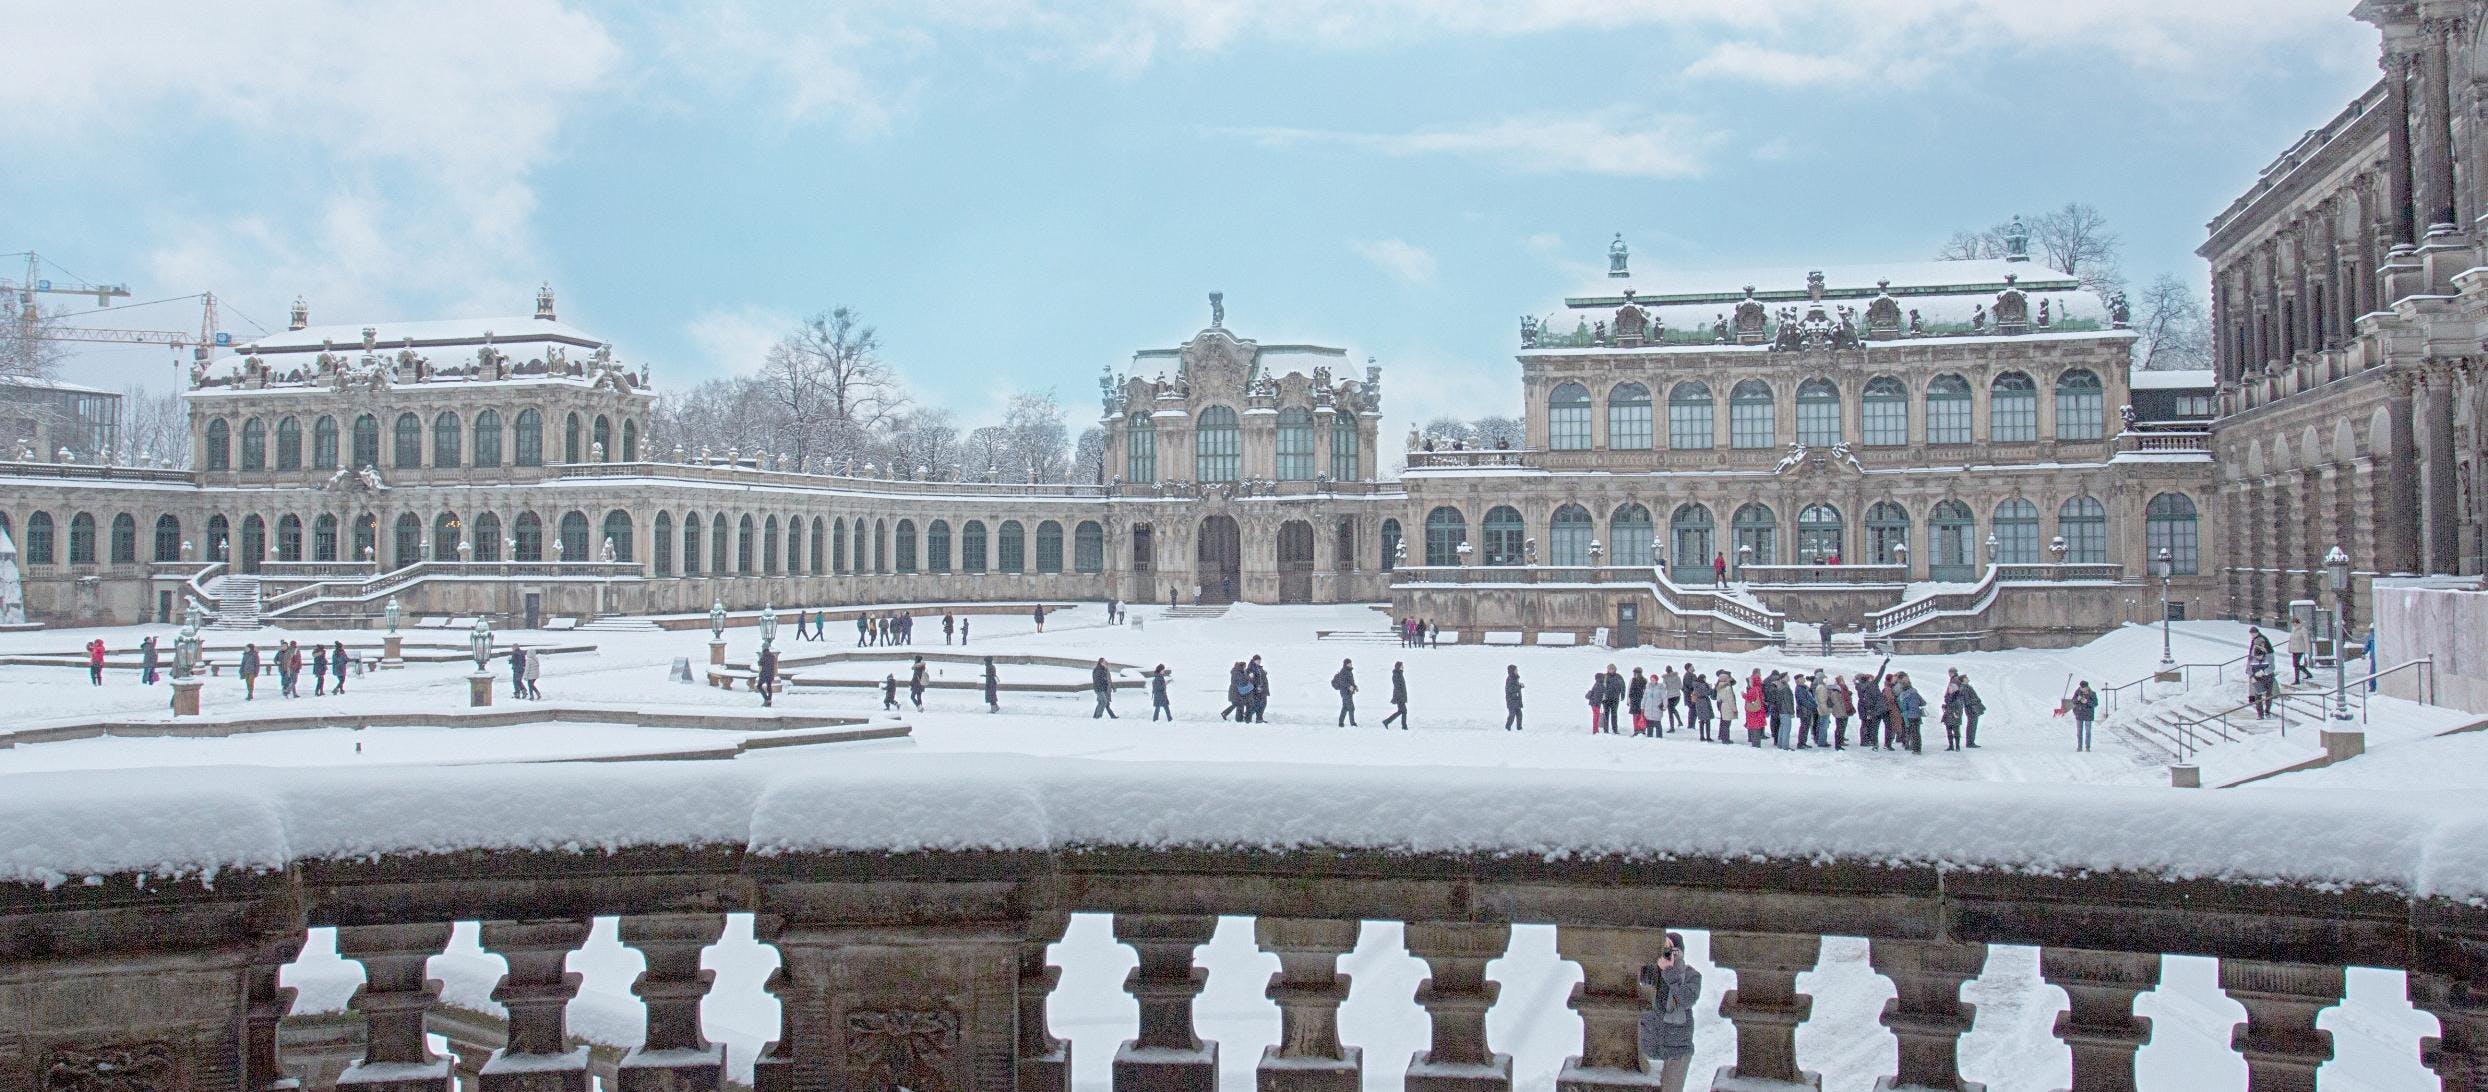 Januar 2019: Dresden Stadtrundgang mit Dresde